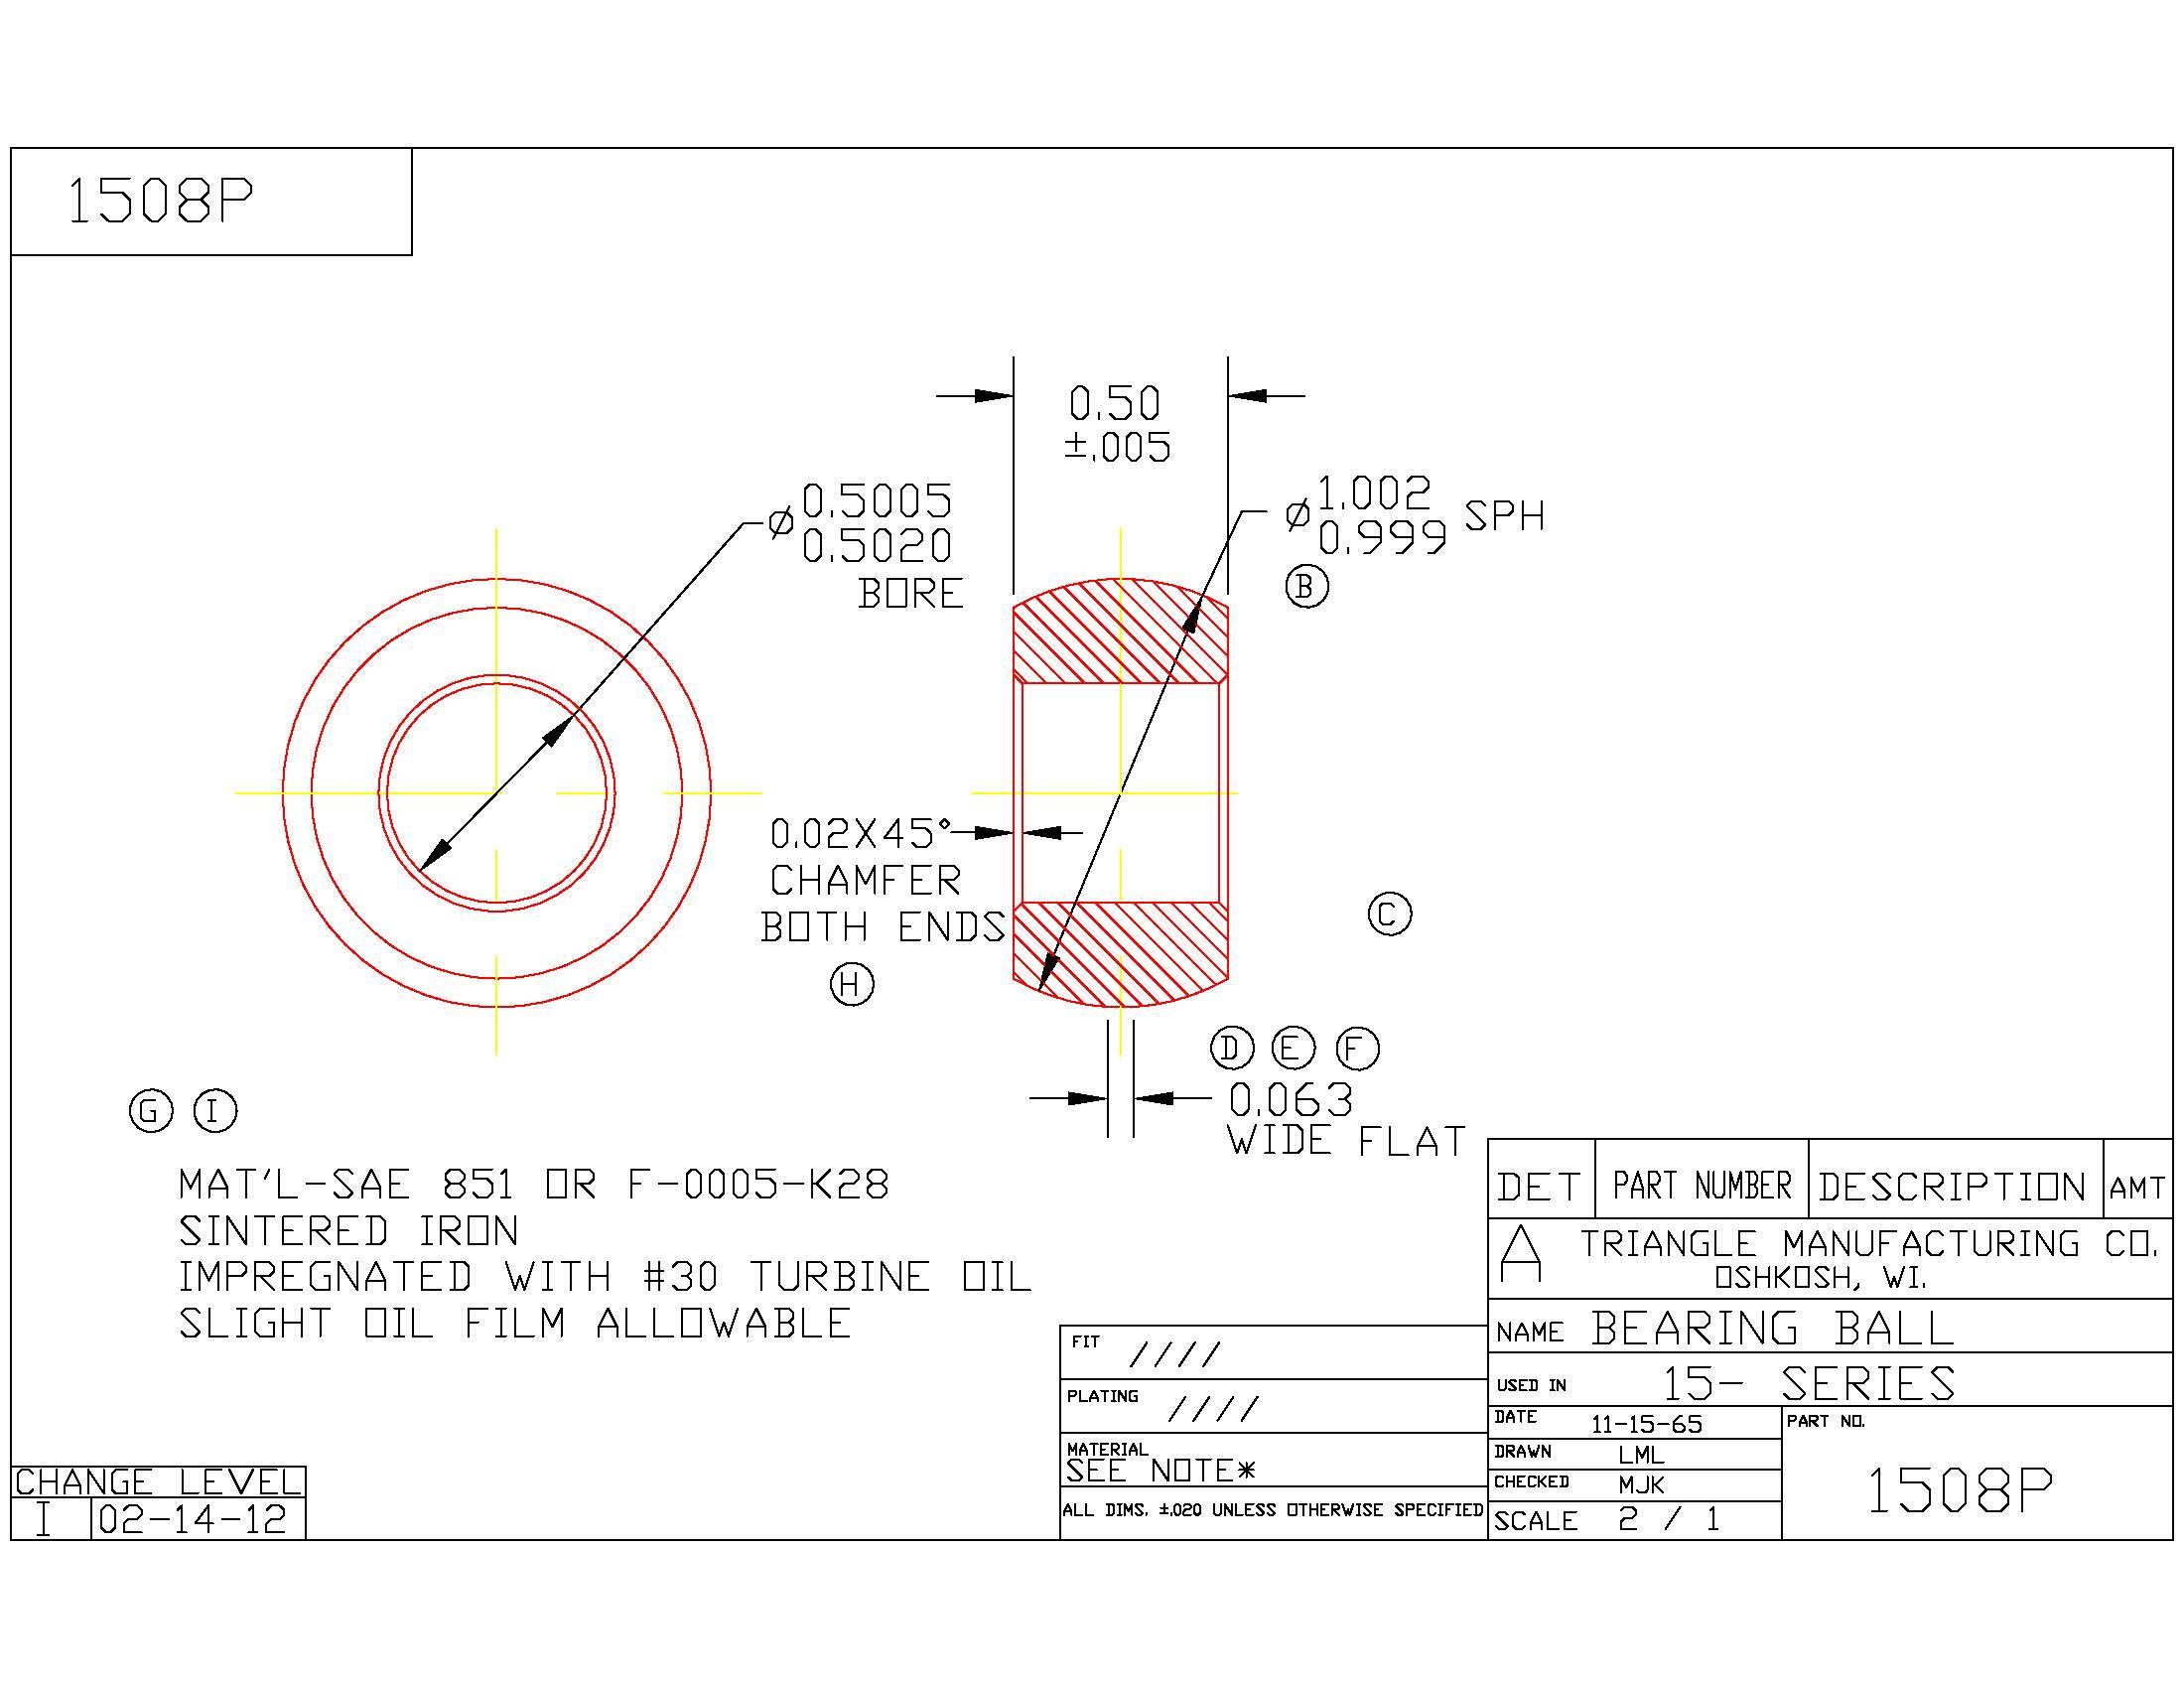 Spherical Plain Bearing 1508P